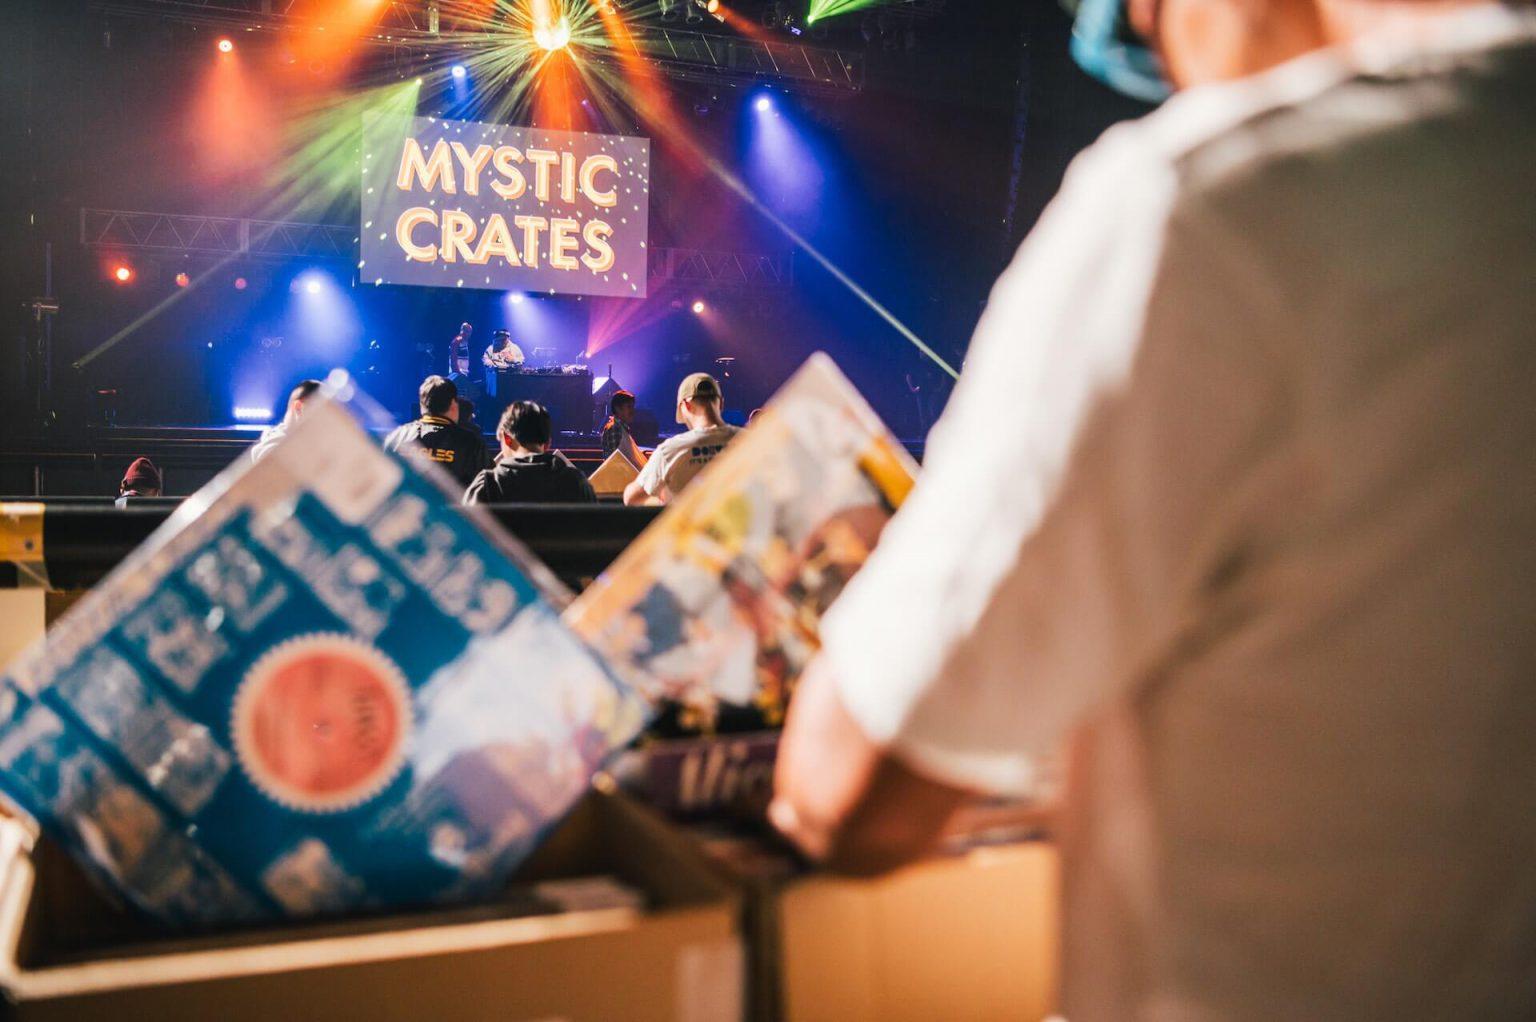 20191102_qetic-05-1440x959 レコード市と音楽パフォーマンスを同時に楽しめるレコード・フェス:Discogs Presents Mystic Crates